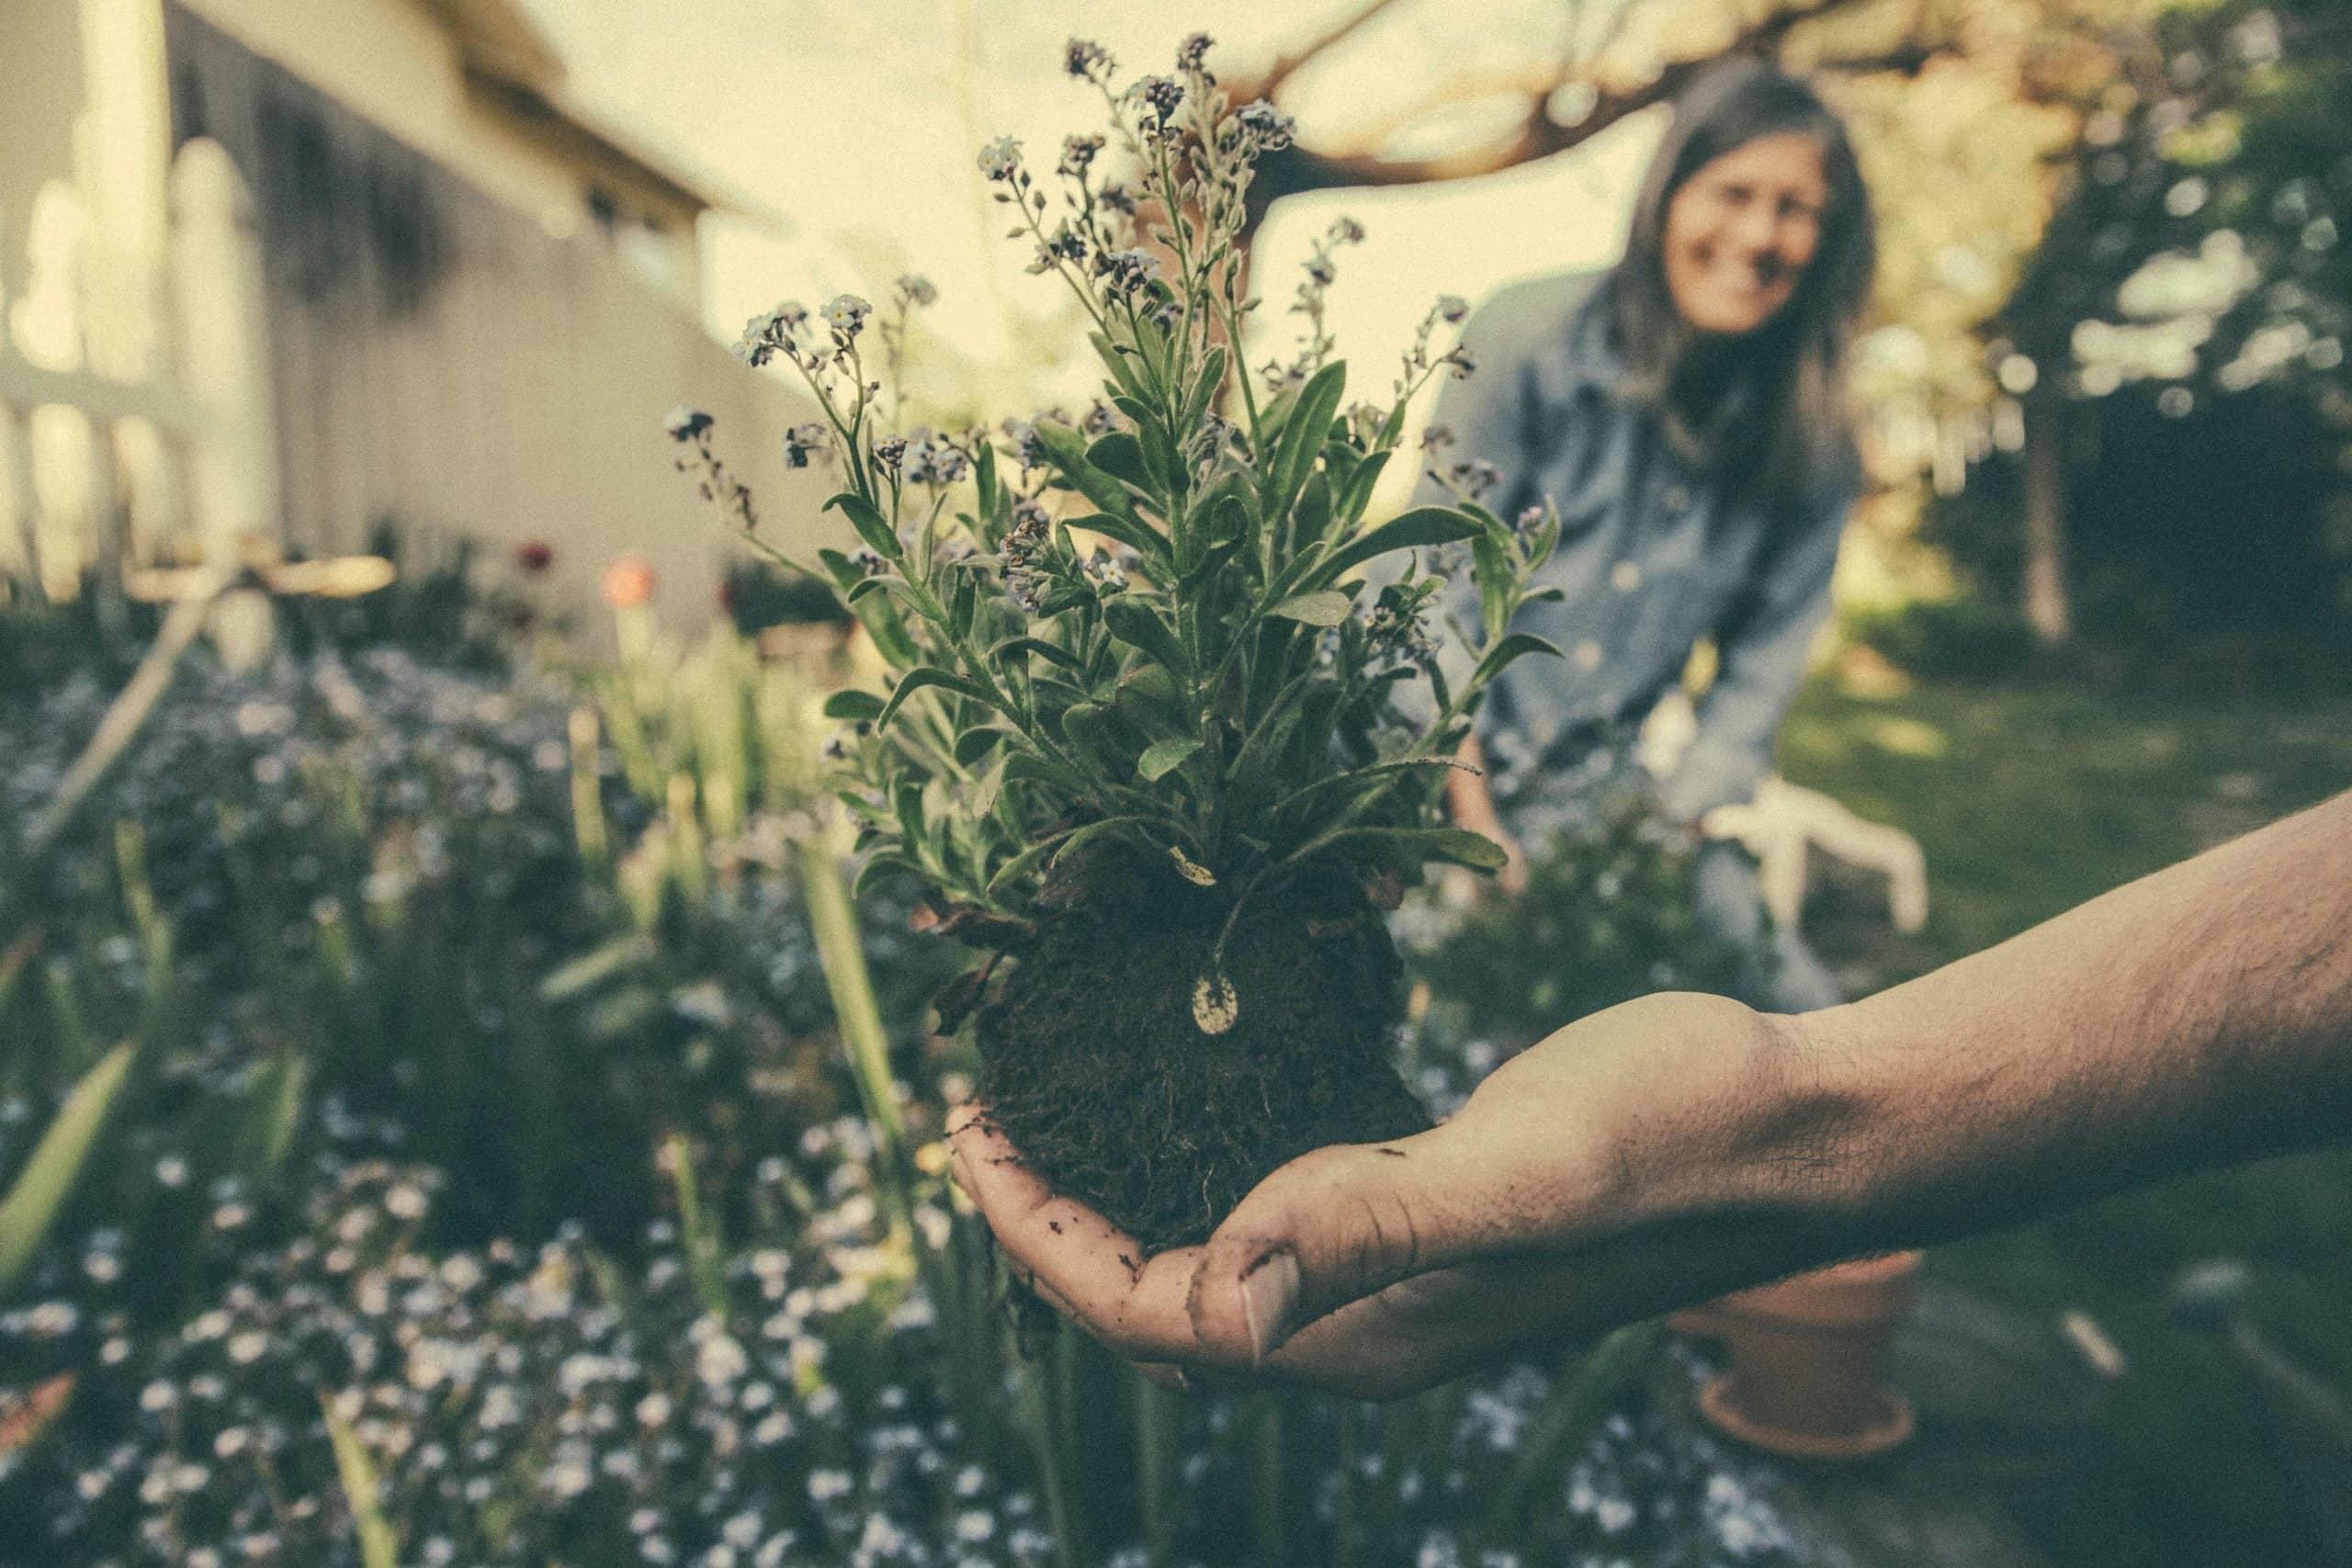 is gardening vegan?